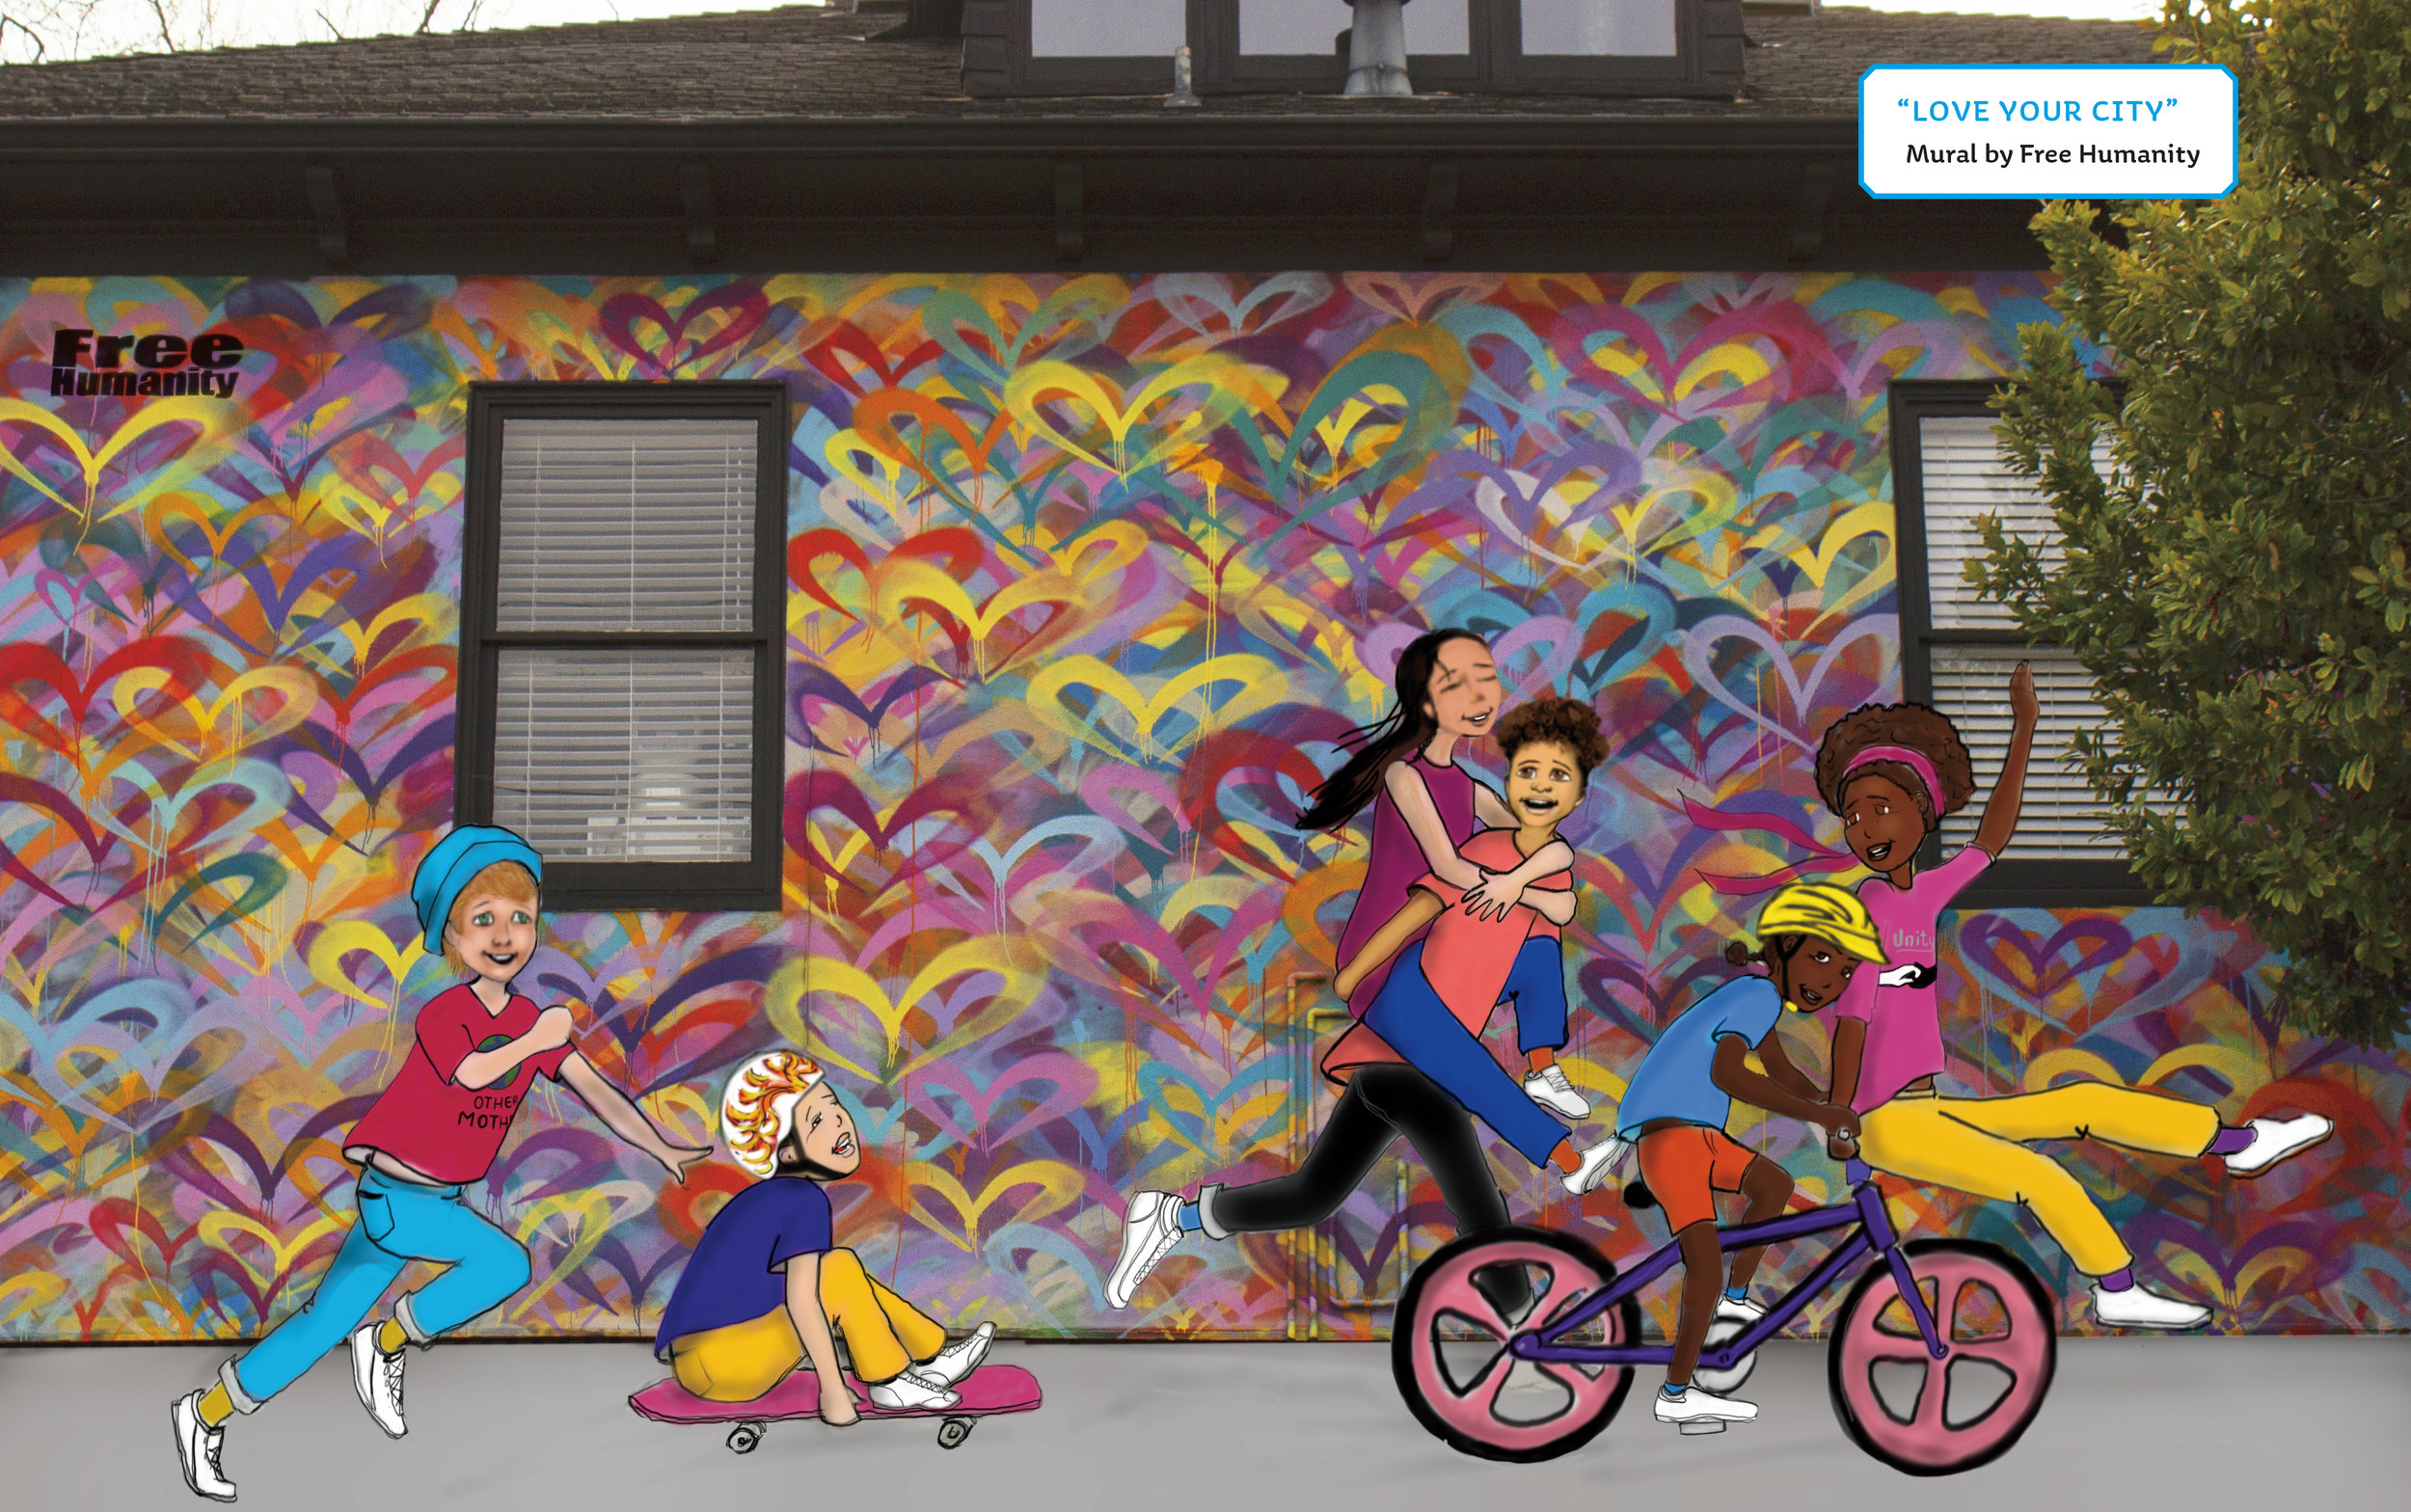 Love-your-city-mural.jpg